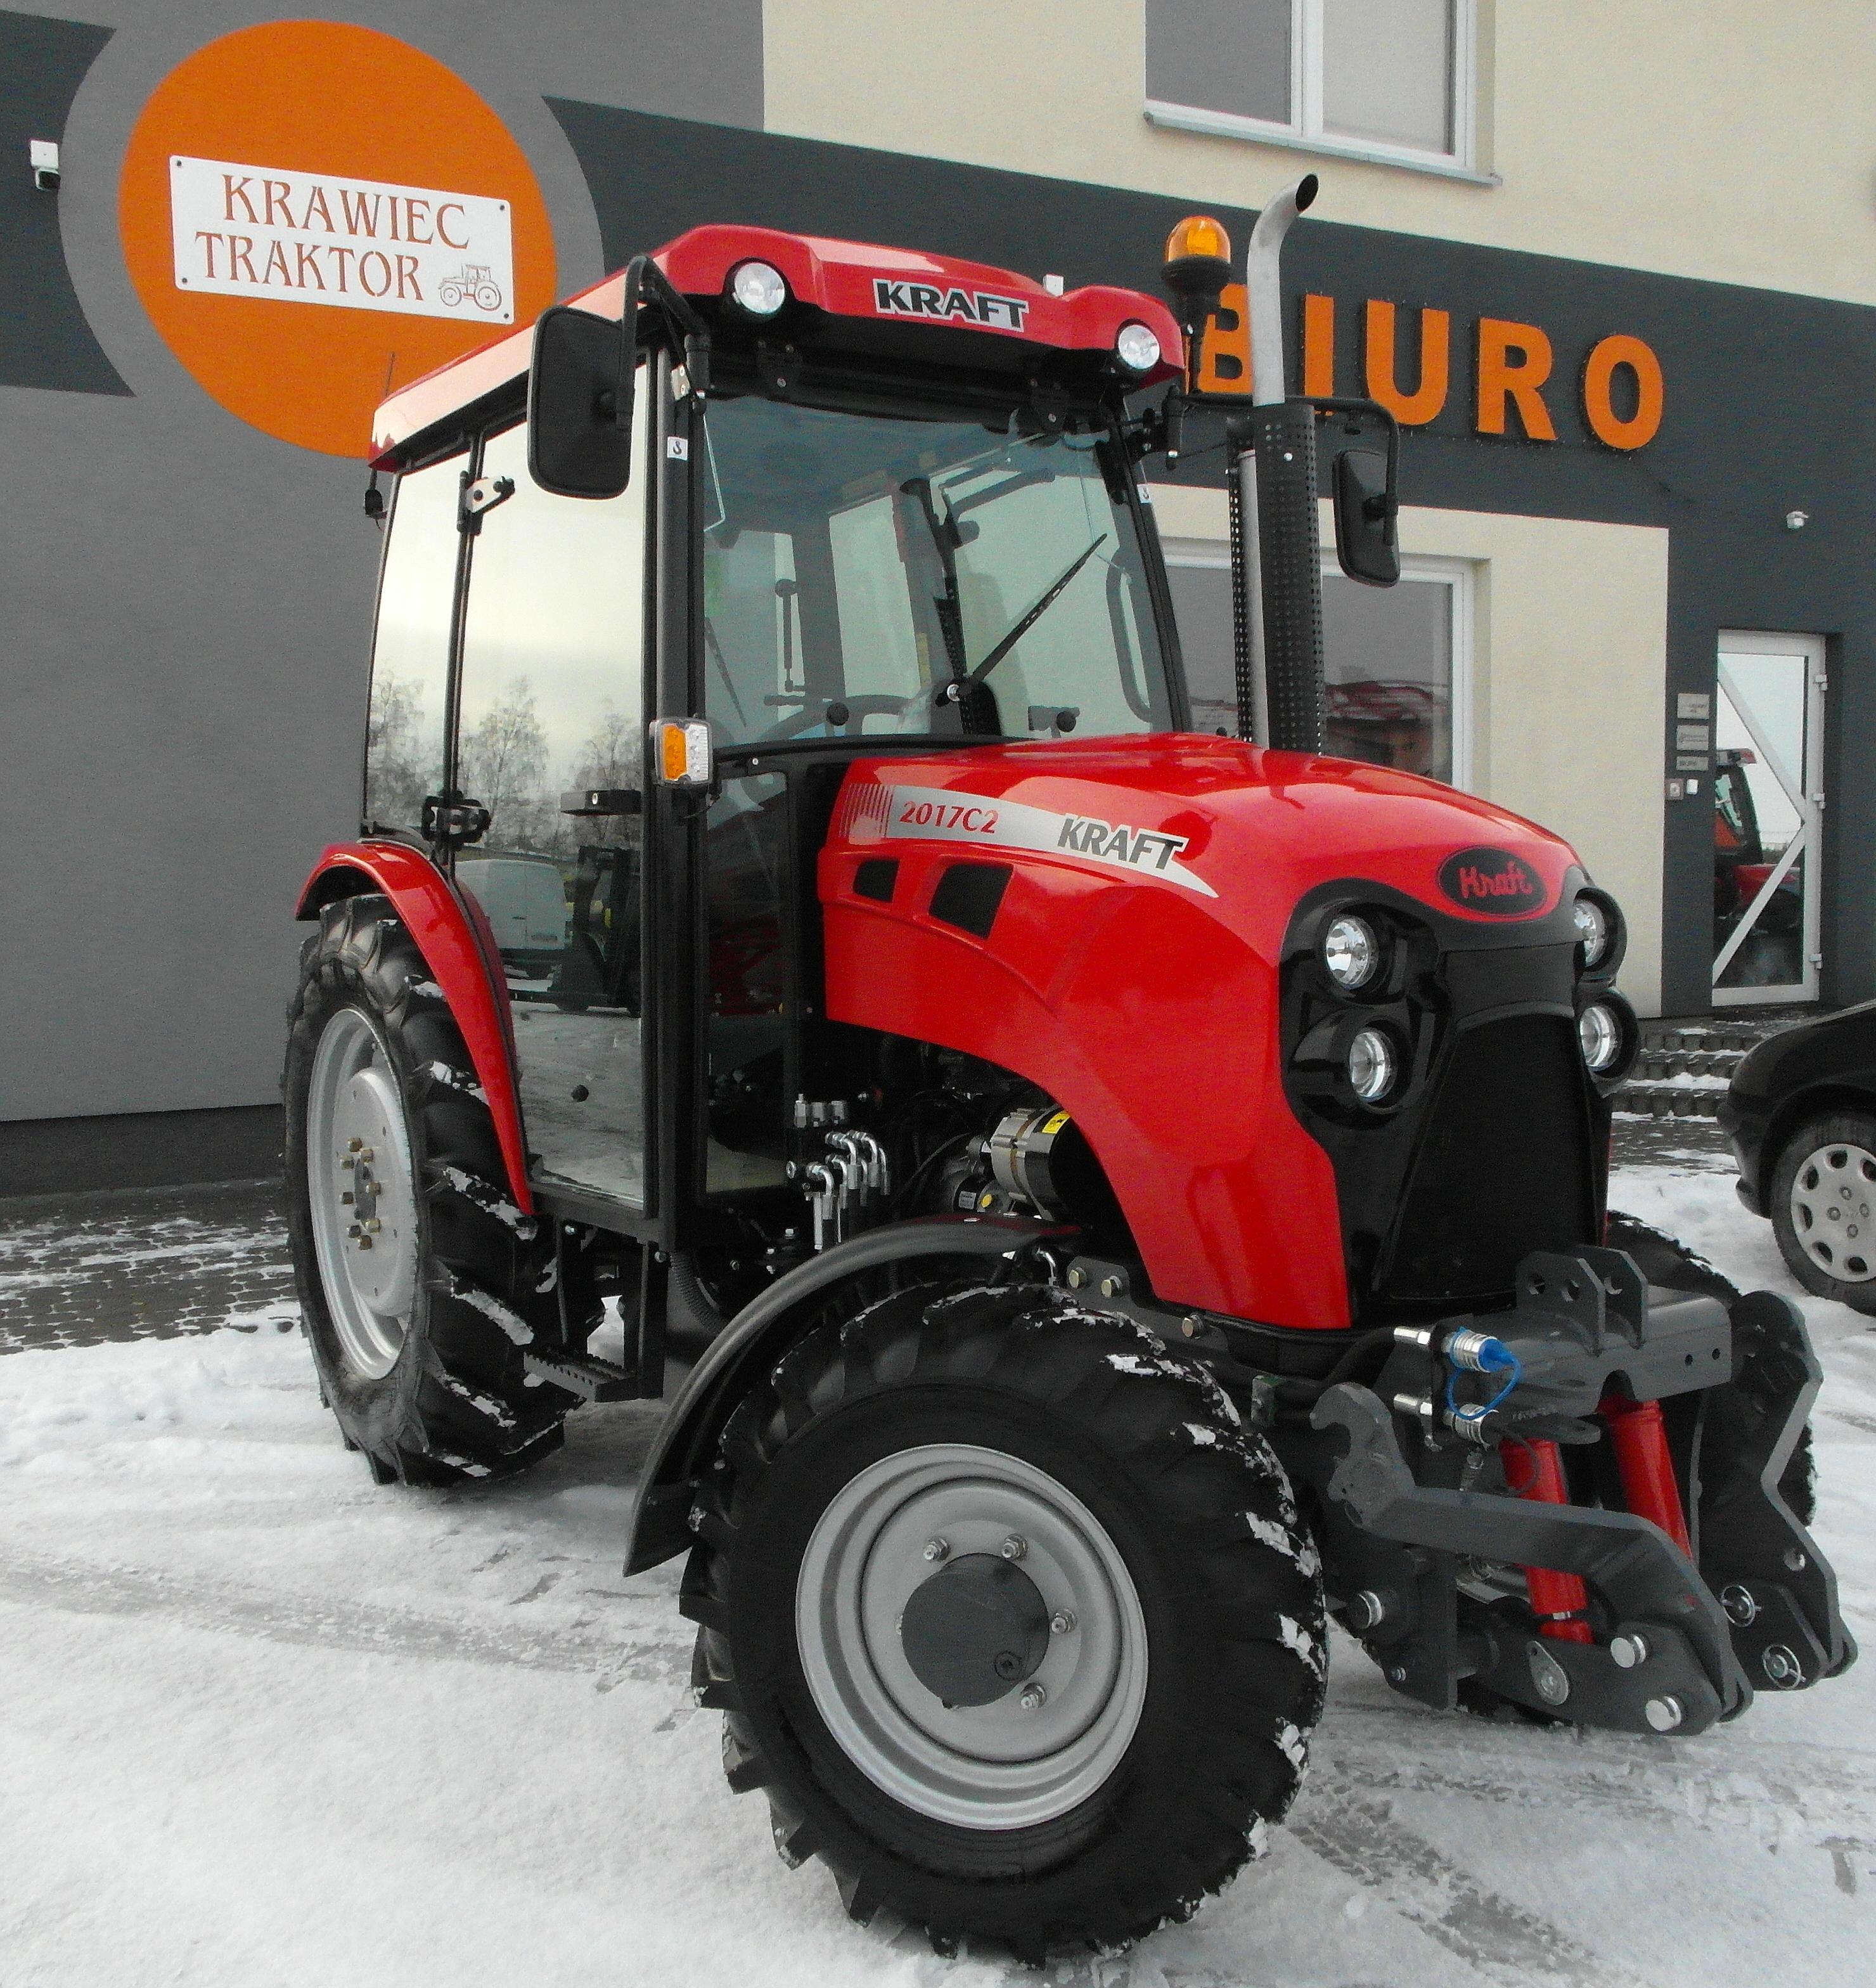 Krawiec Traktor